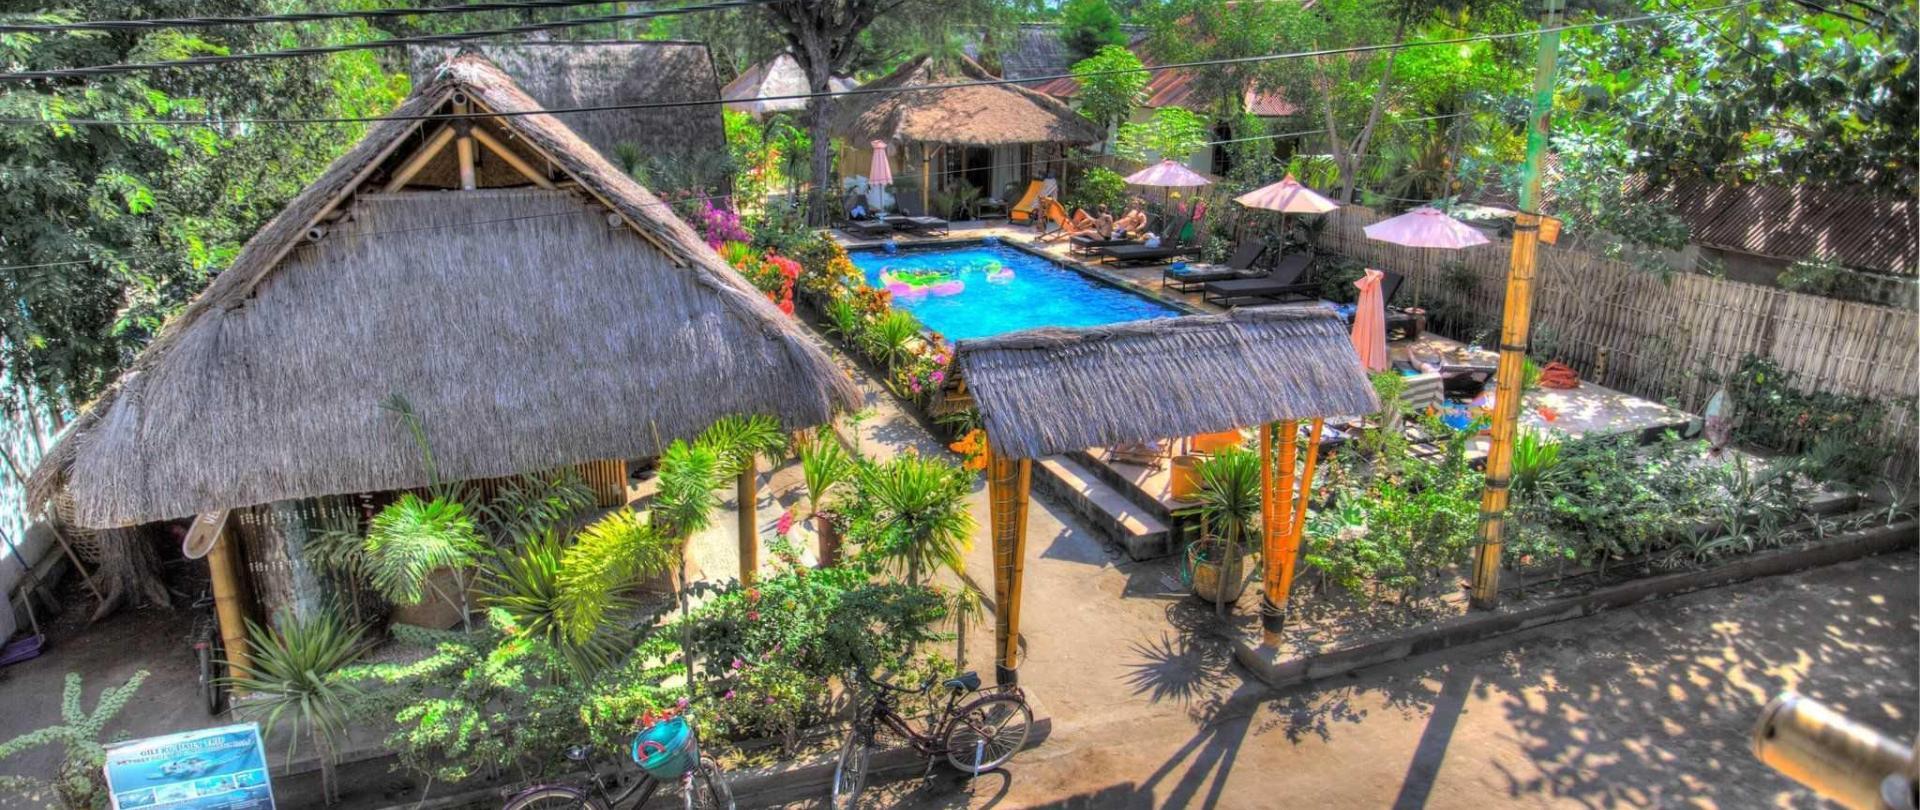 bambu-cottage-8-sur-13-1.jpg